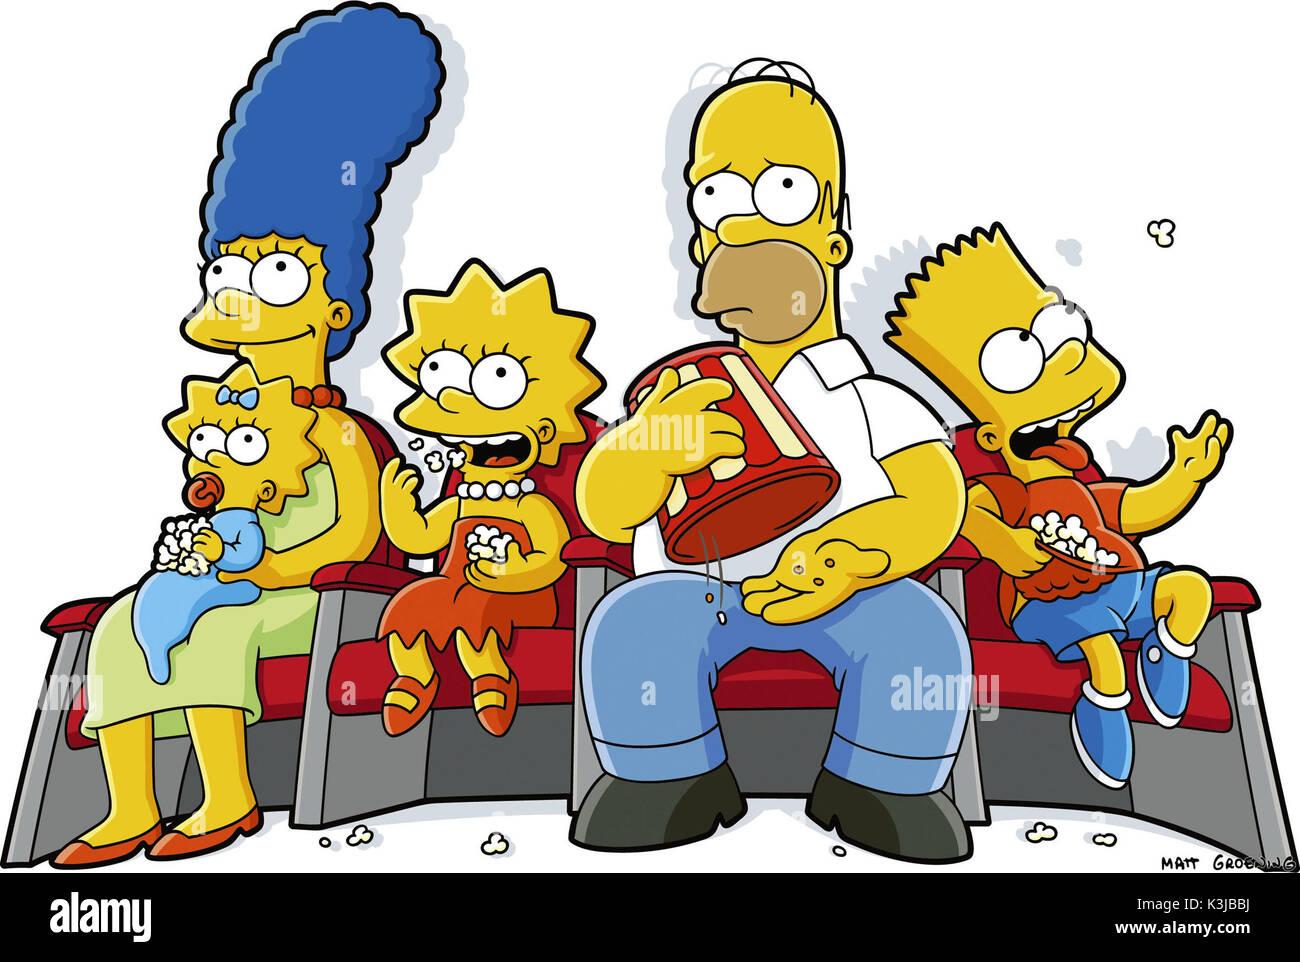 Lisa simpson bart simpson stock photos lisa simpson bart simpson stock images alamy - Marge simpson et bart ...